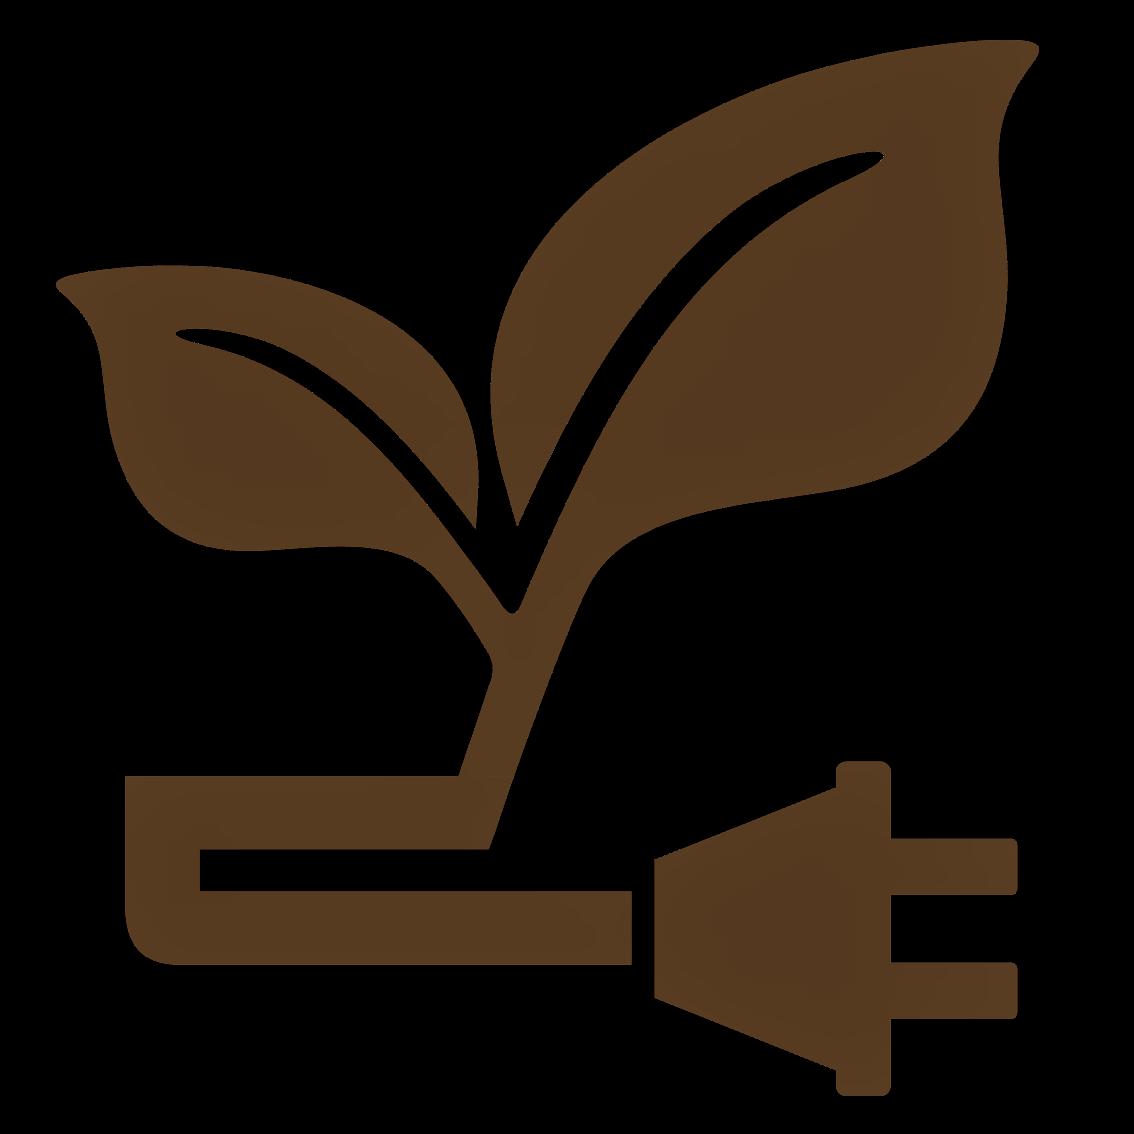 Leaf Icon Watermark